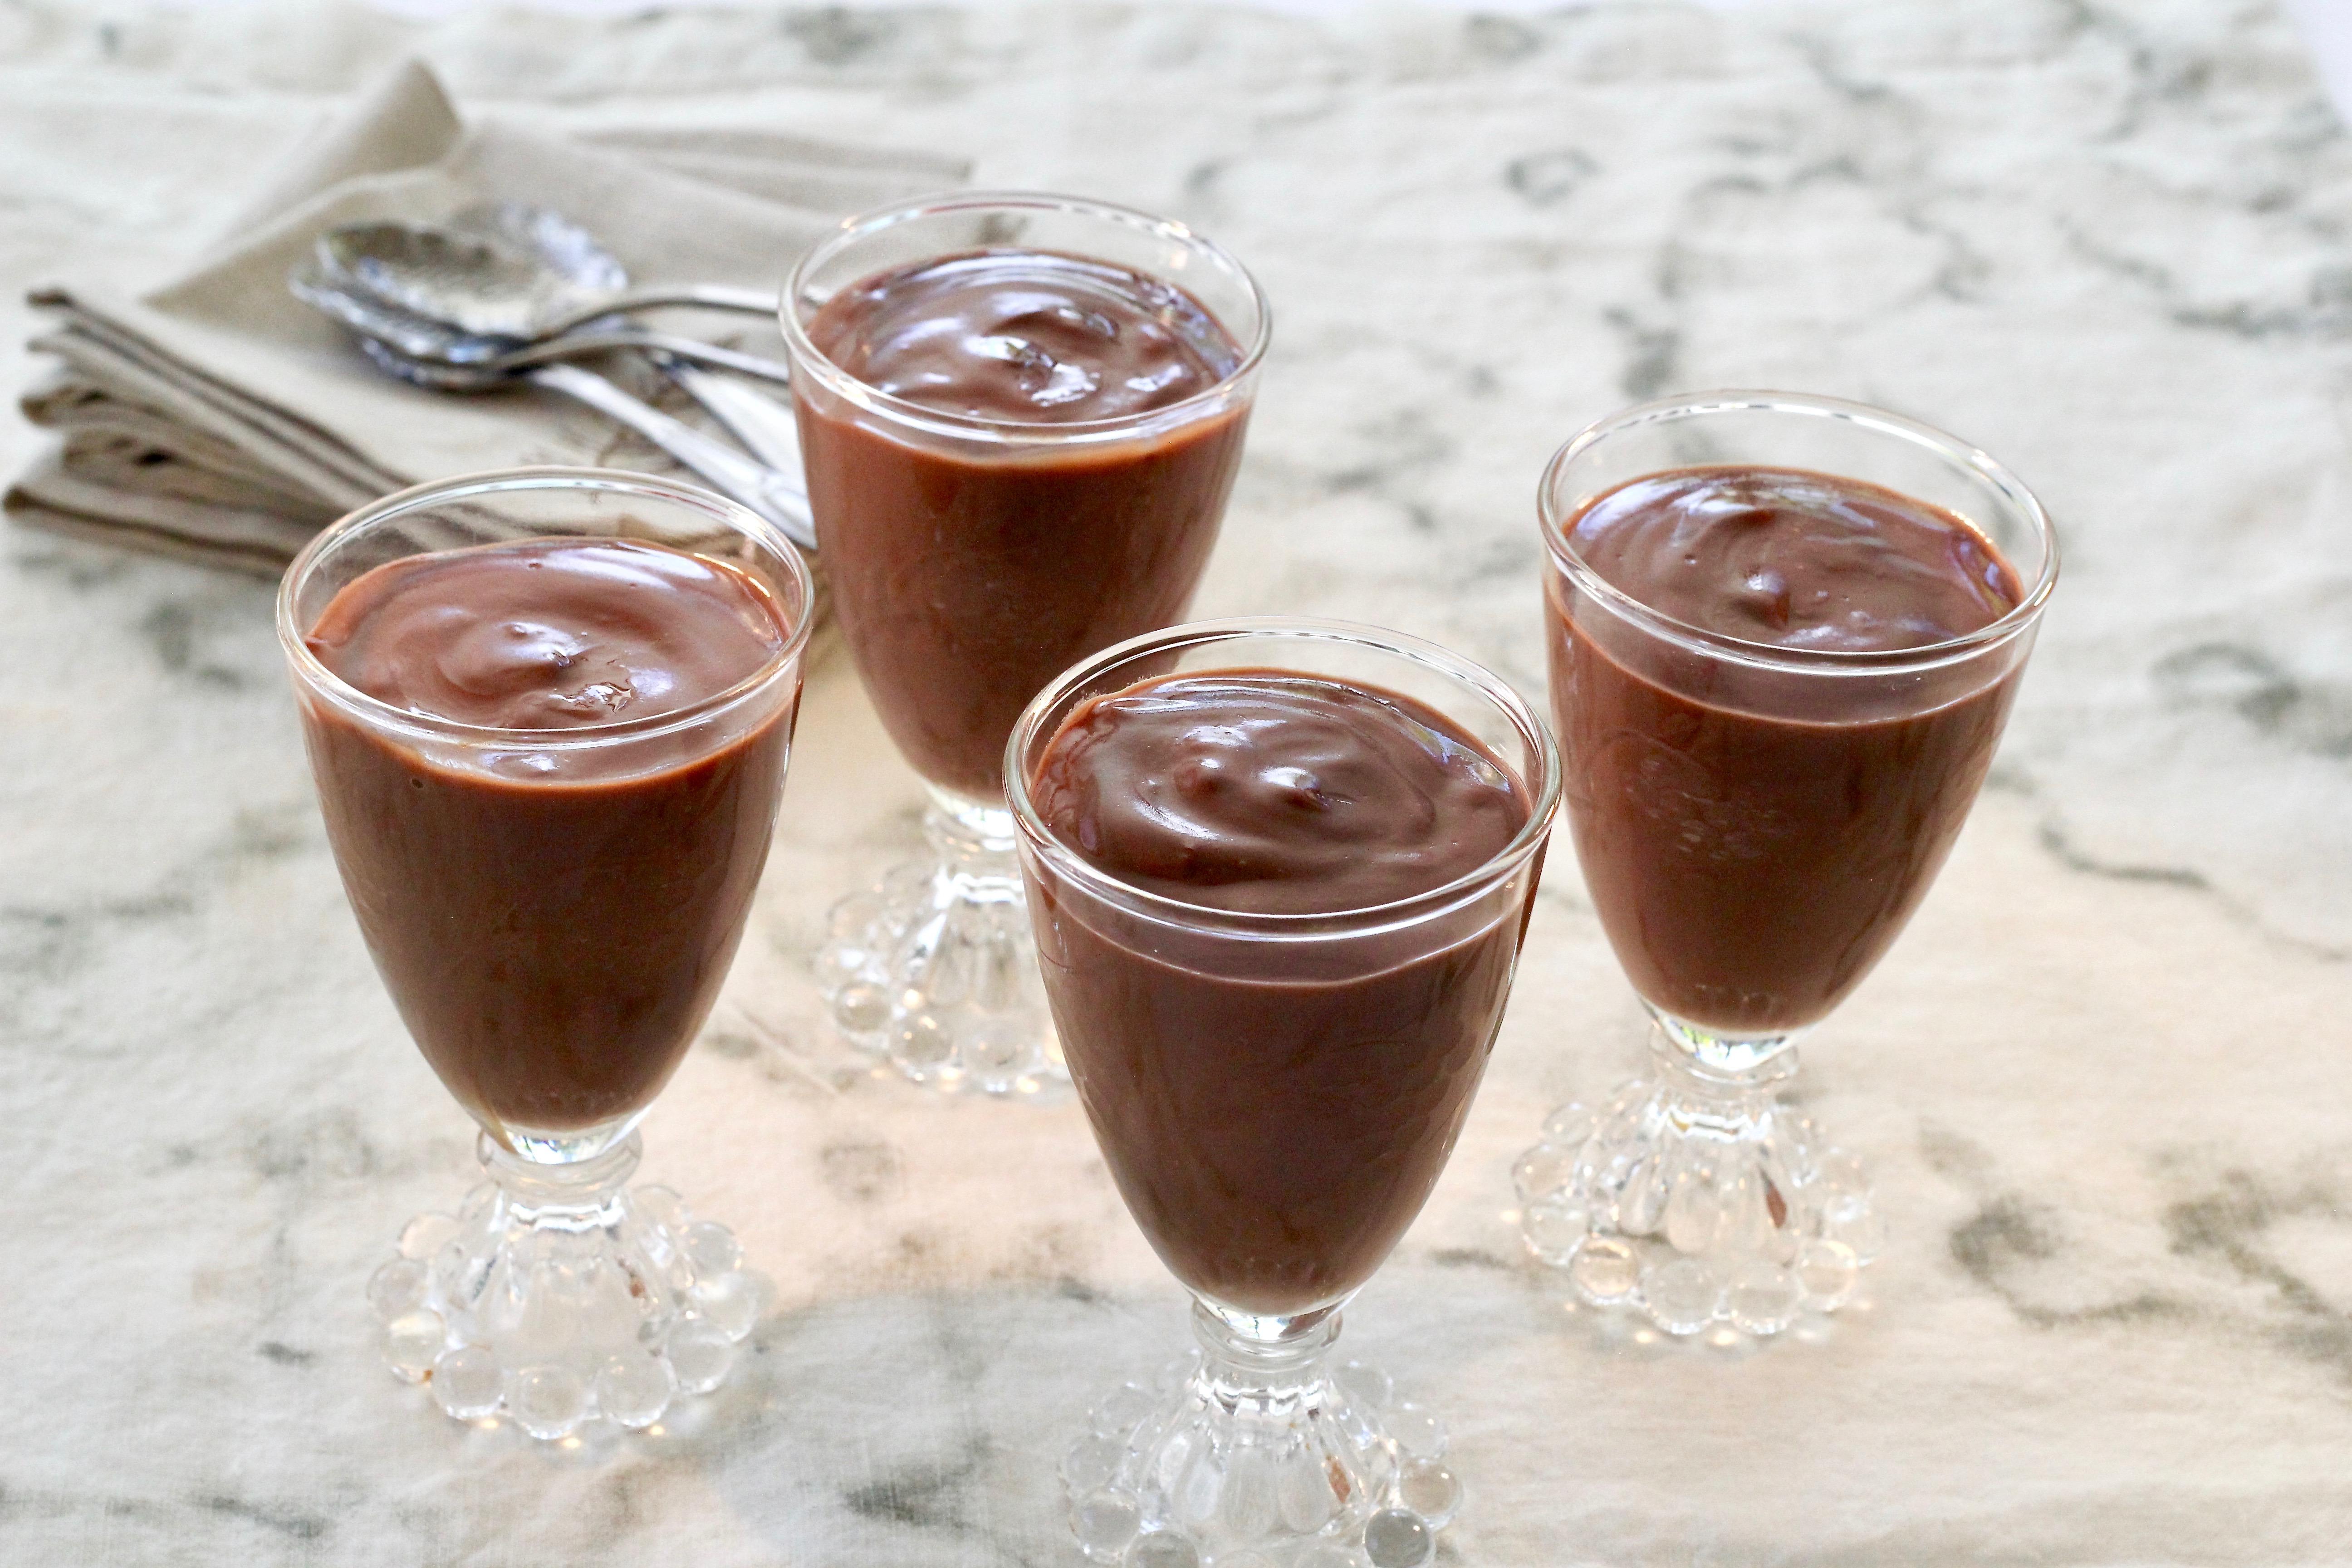 Nana's Homemade Chocolate Pudding